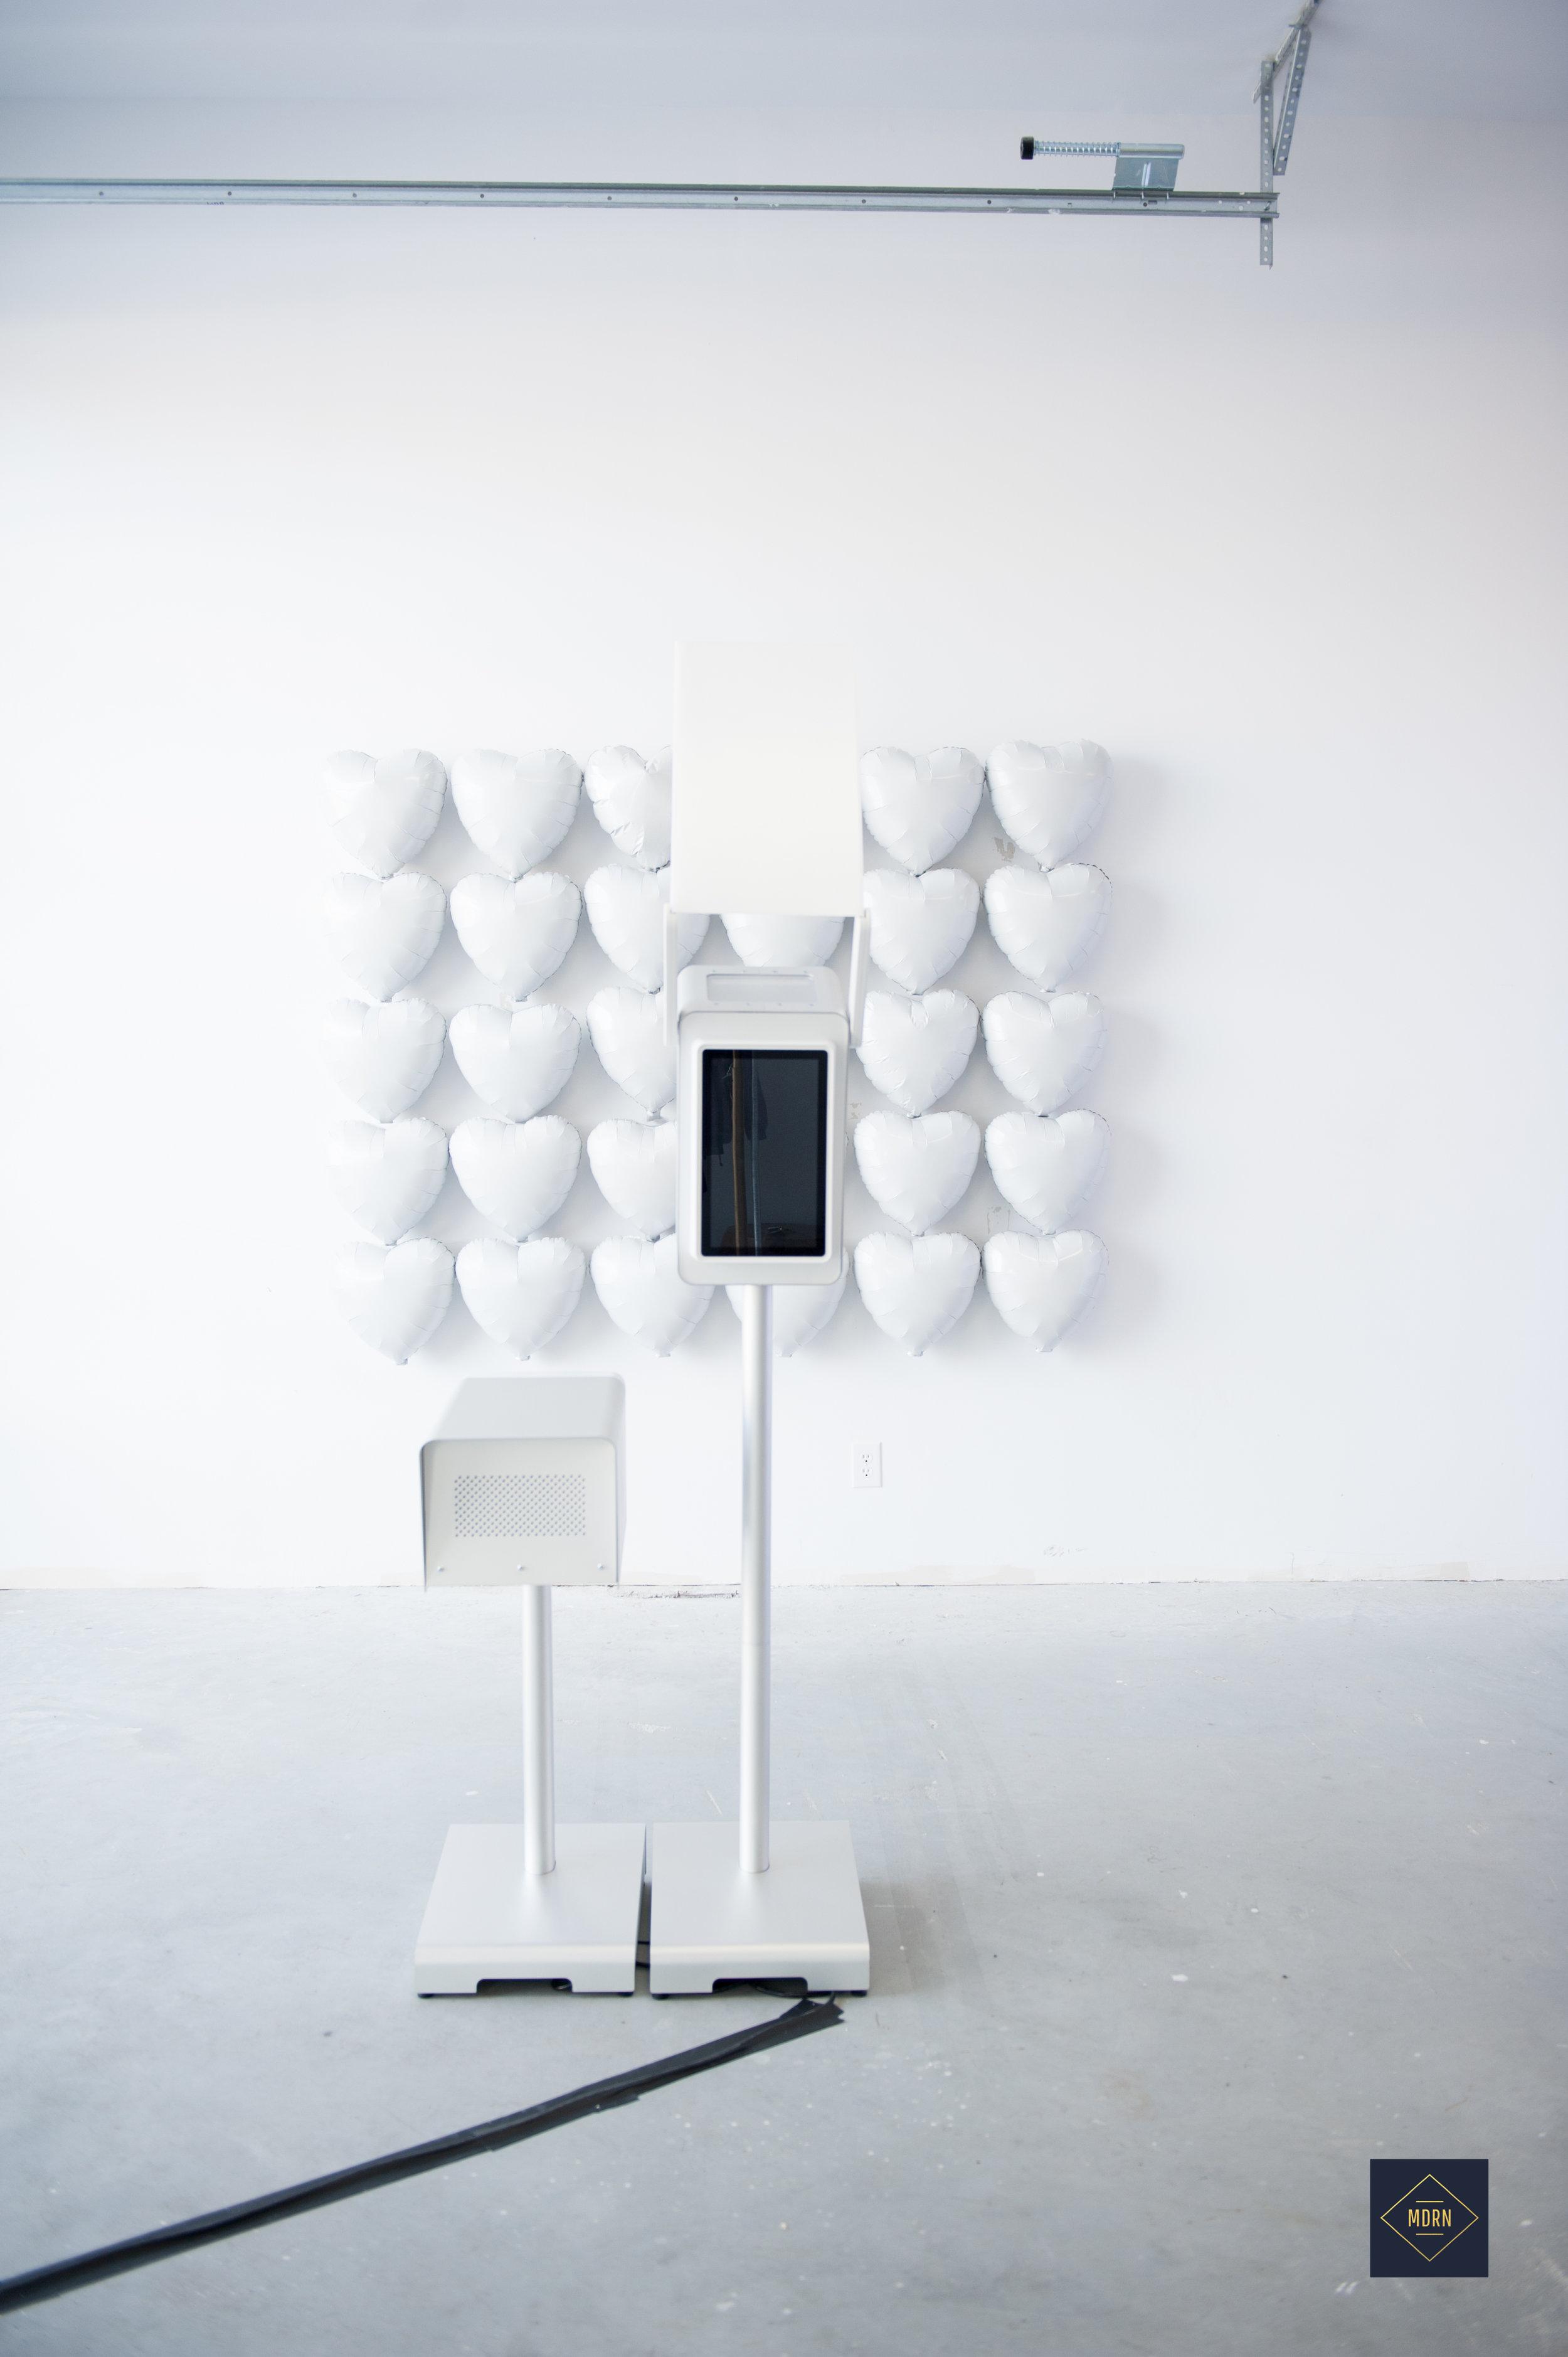 White Monochrome balloon backdrop and all white photobooth